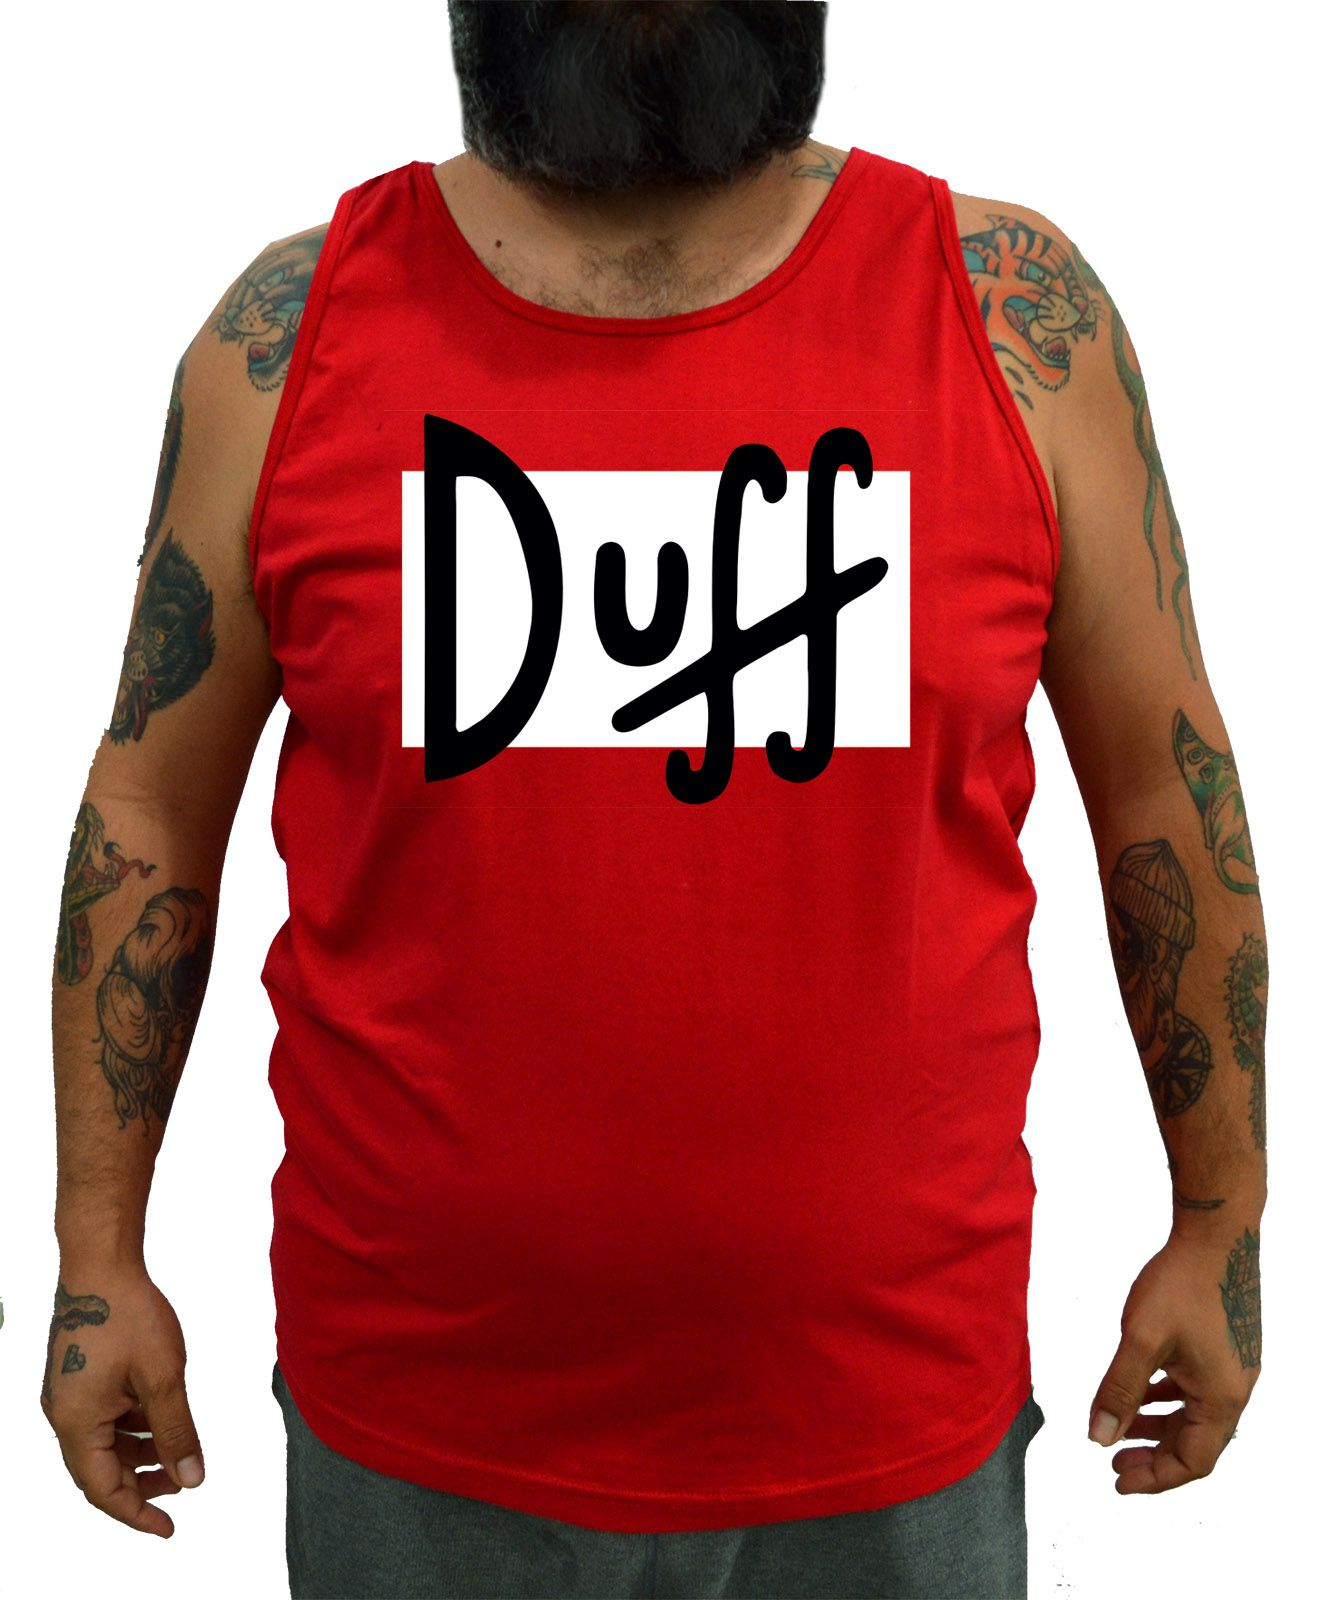 Regata Plus Size Duff Cerveja - Tamanho XG  - HShop